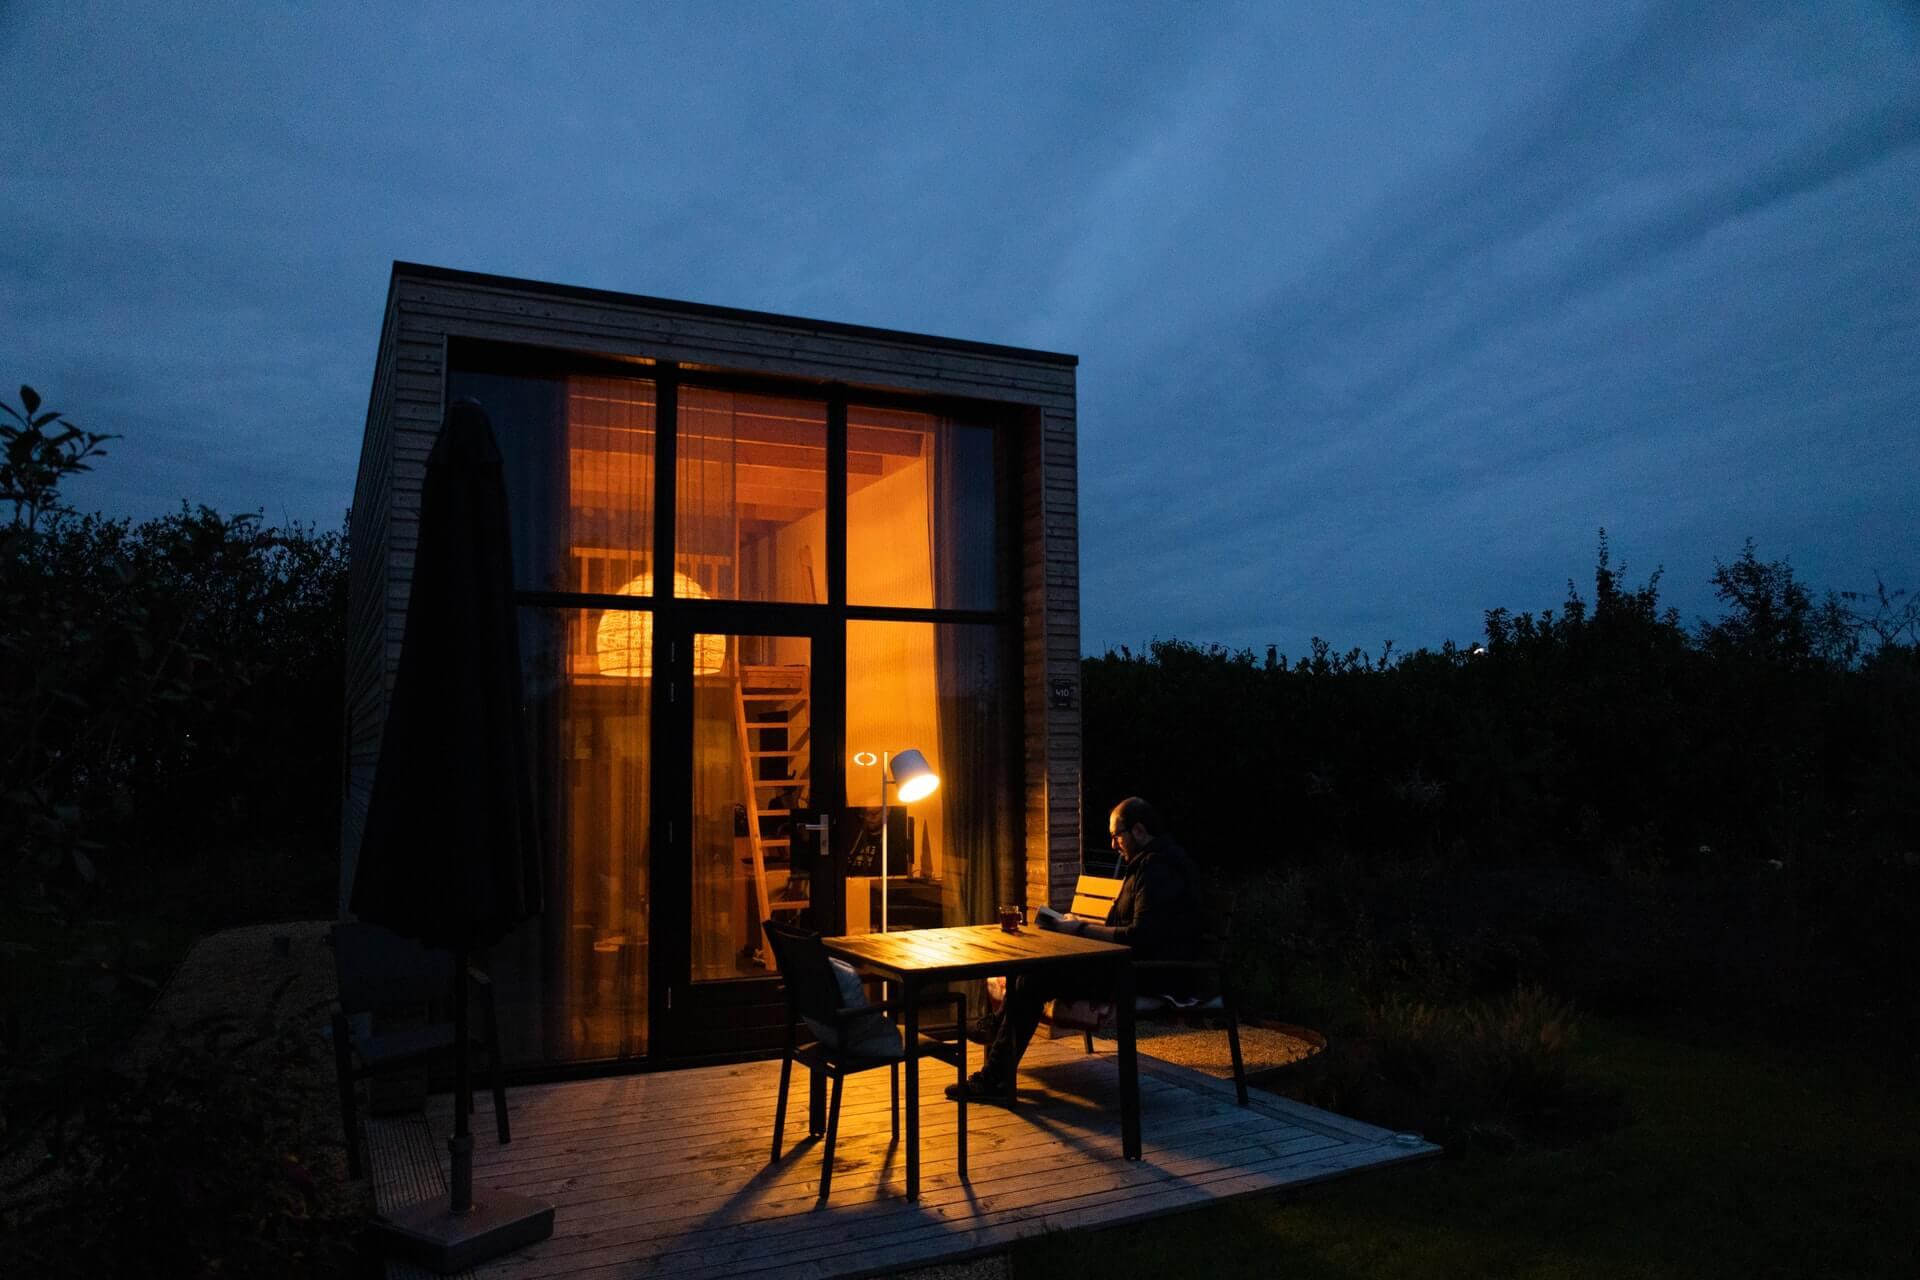 Romantic Getaways Cabins in Gatlinburg, TN